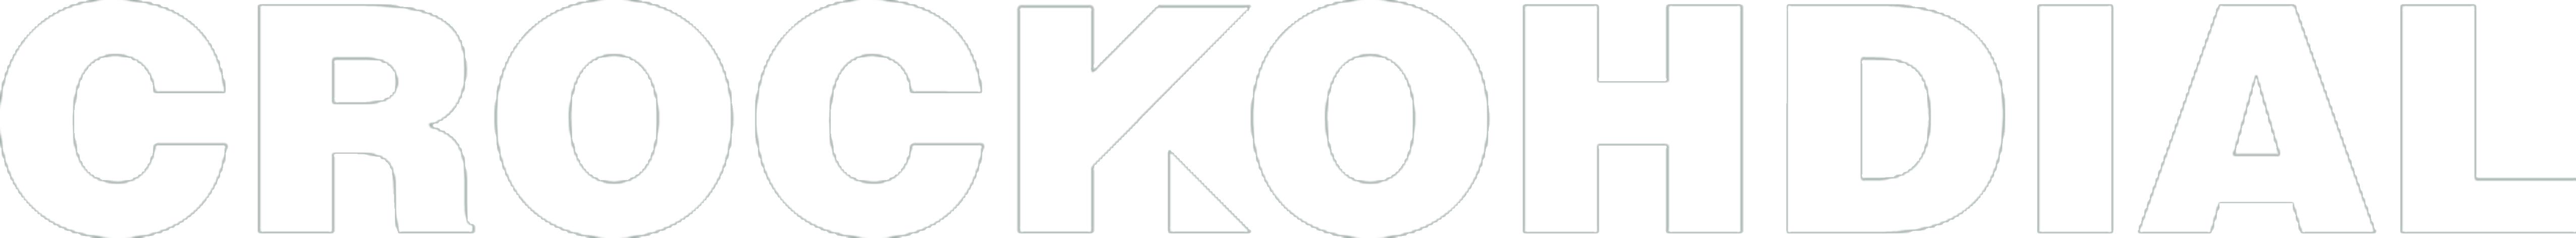 Crockohdial Logo